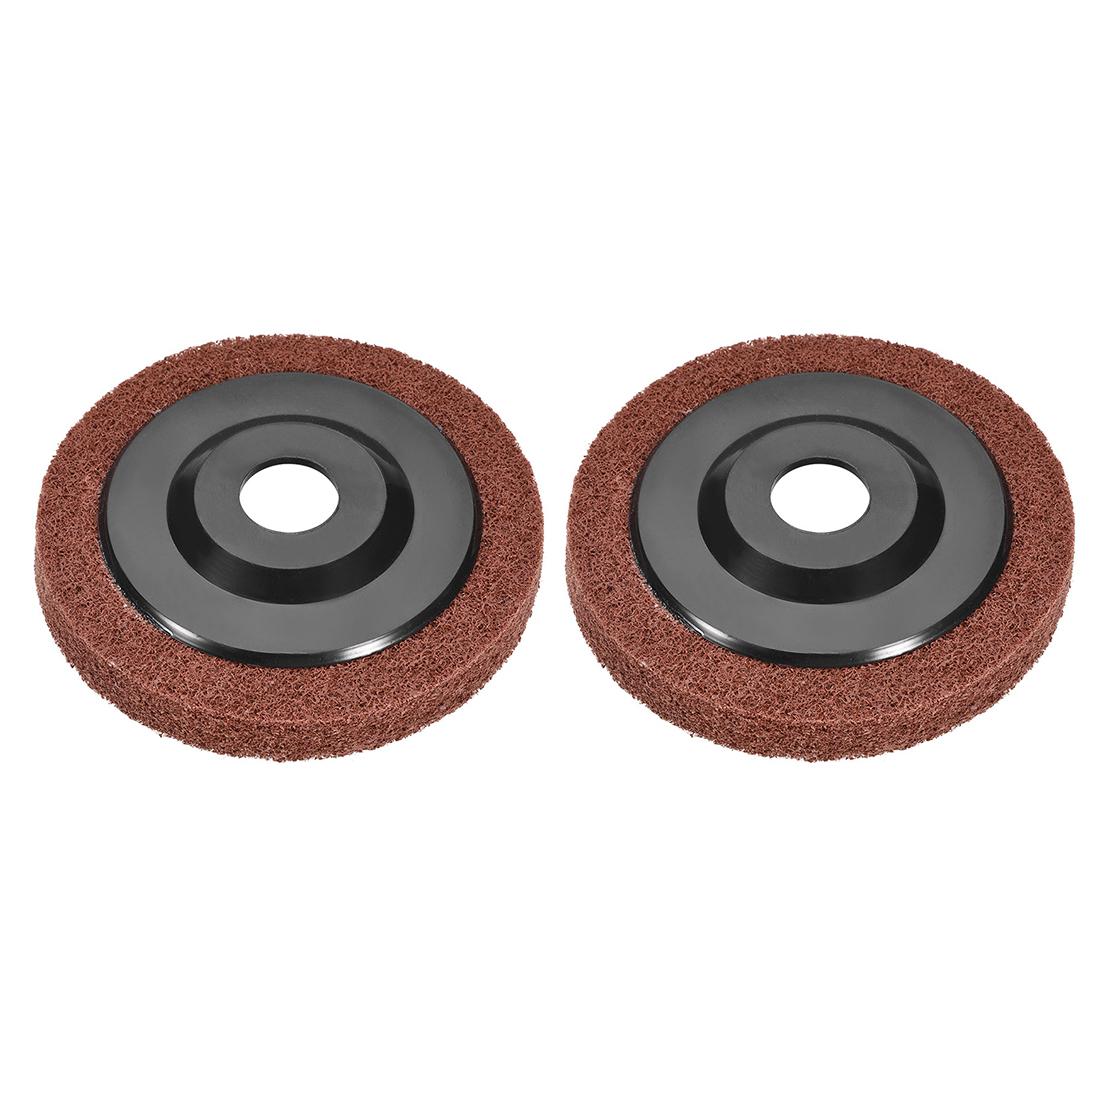 4.5 Inch Polishing Wheel Buffing Pad Felt Disc for 100 Angle Grinders Black 2pcs